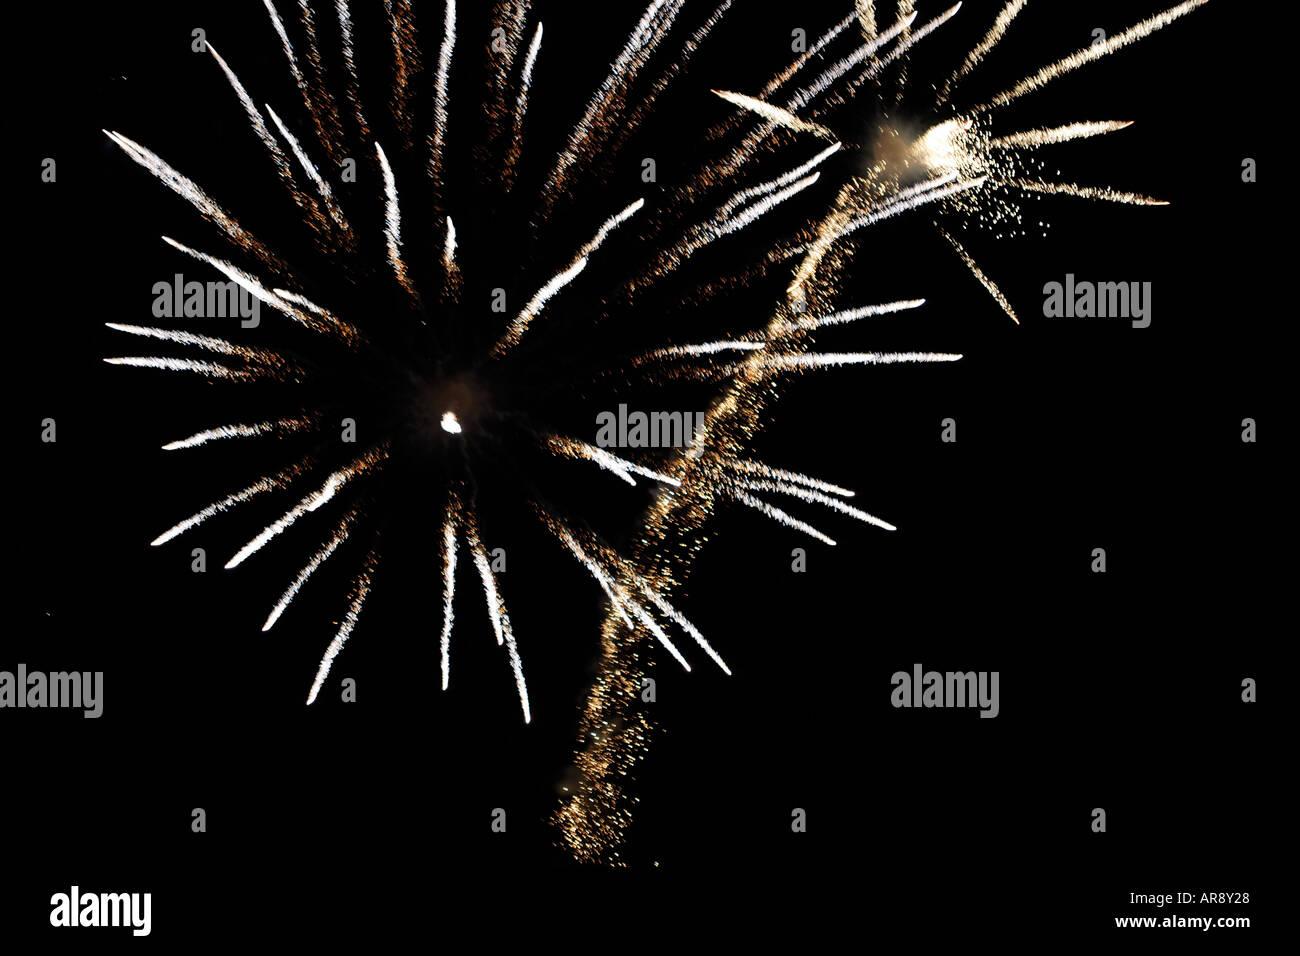 Fireworks 5th November Guy Fawkes Bonfire night UK Stock Photo